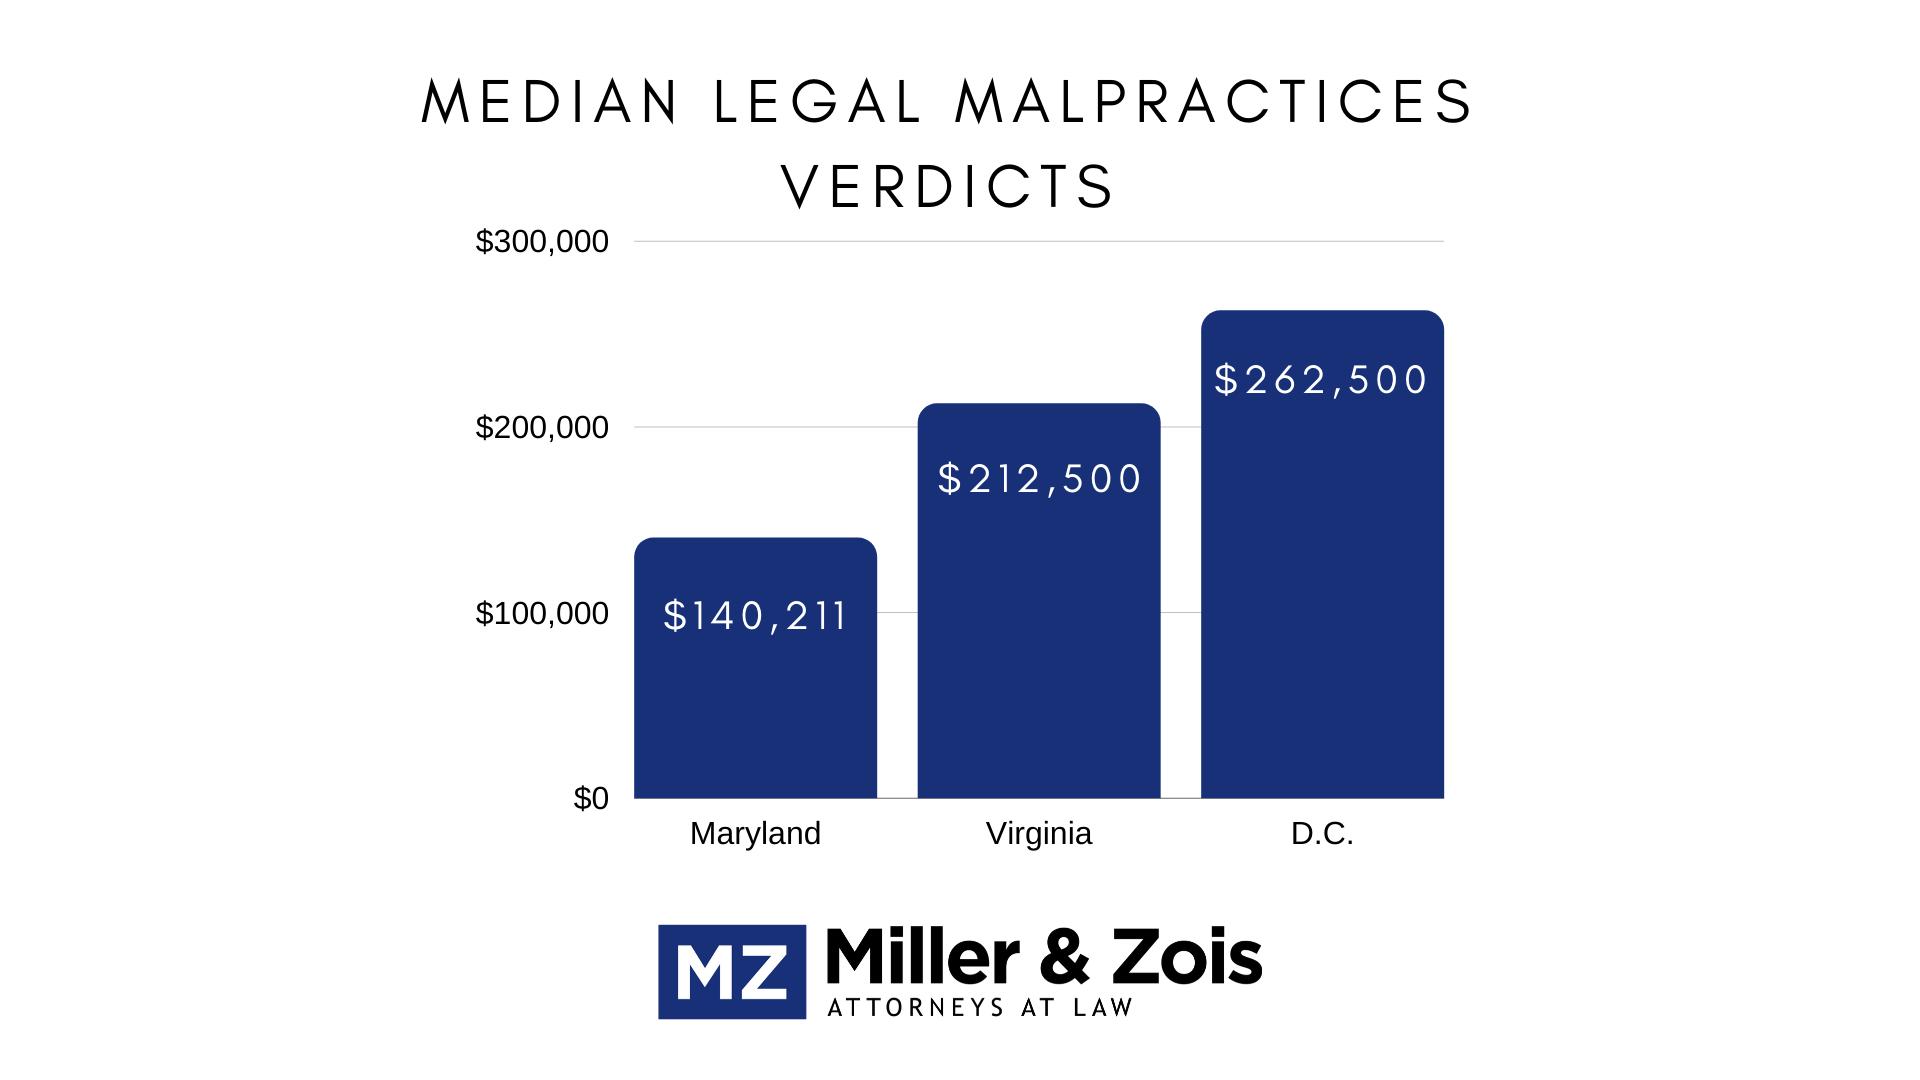 median legal malpractice verdicts